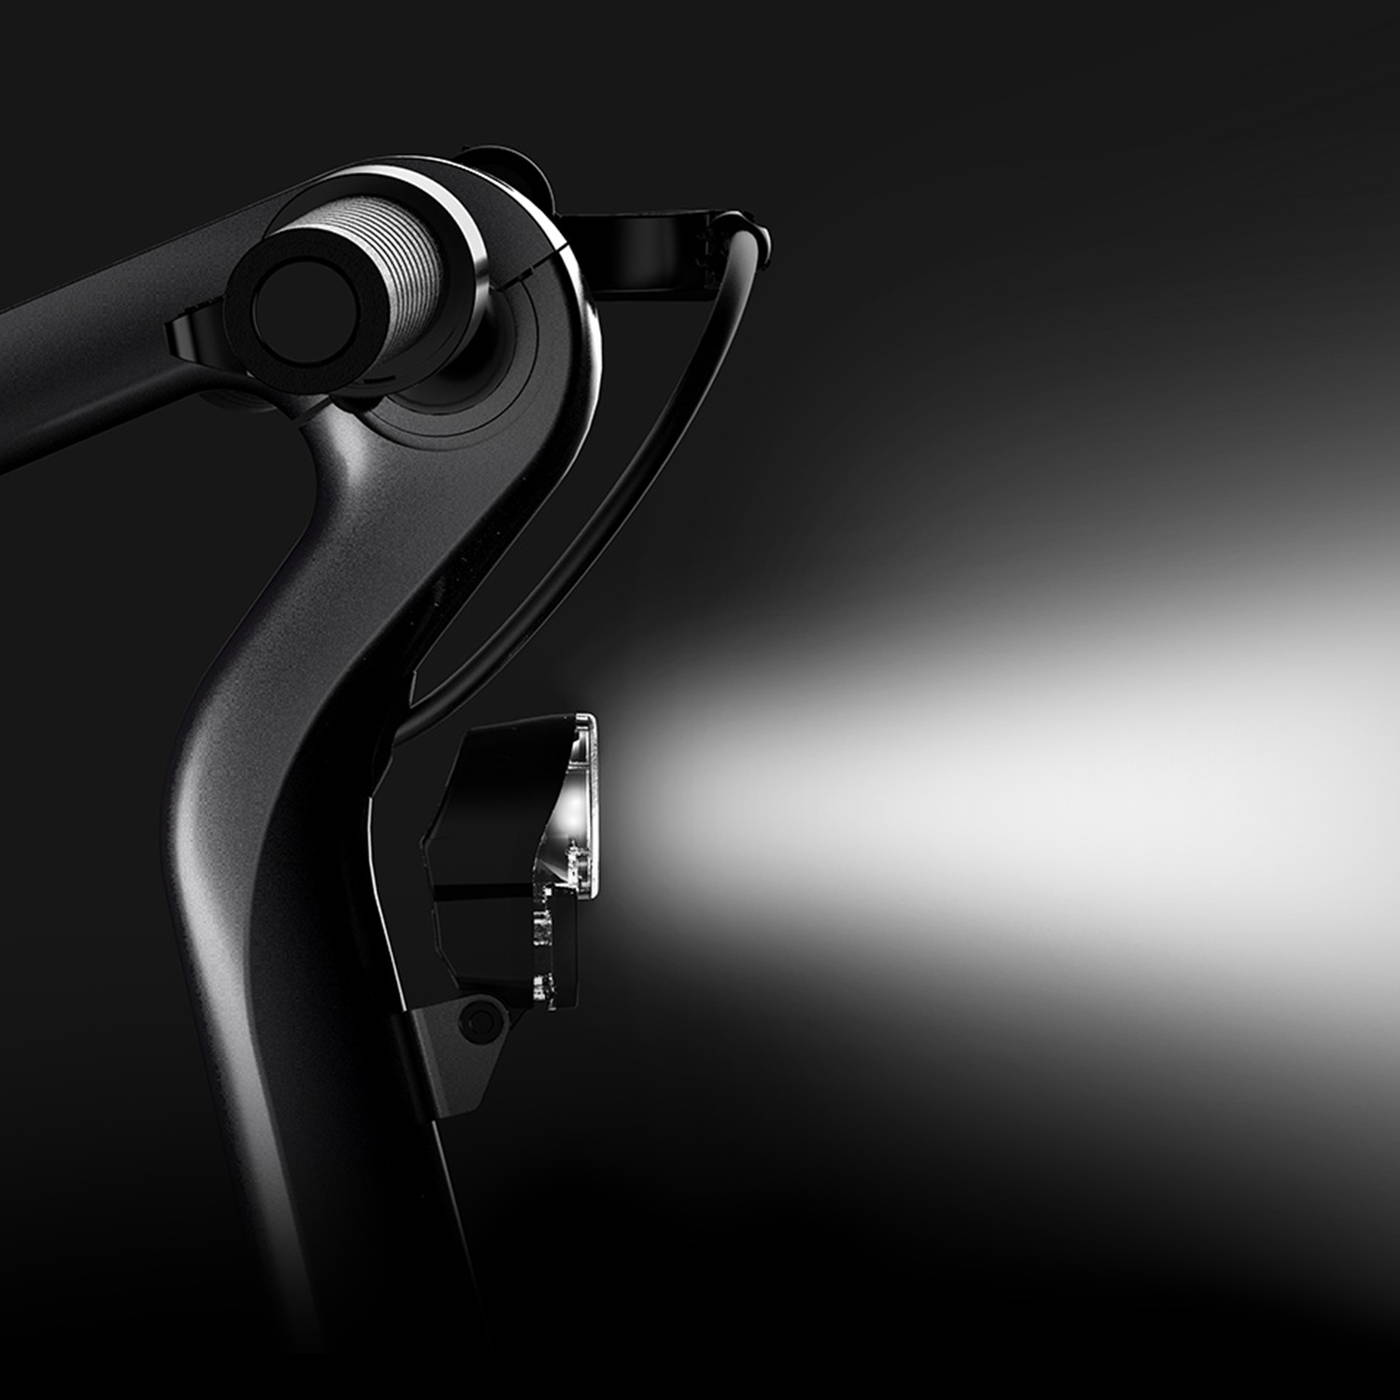 okai-electric-scooter-es500-light-dark-mobile